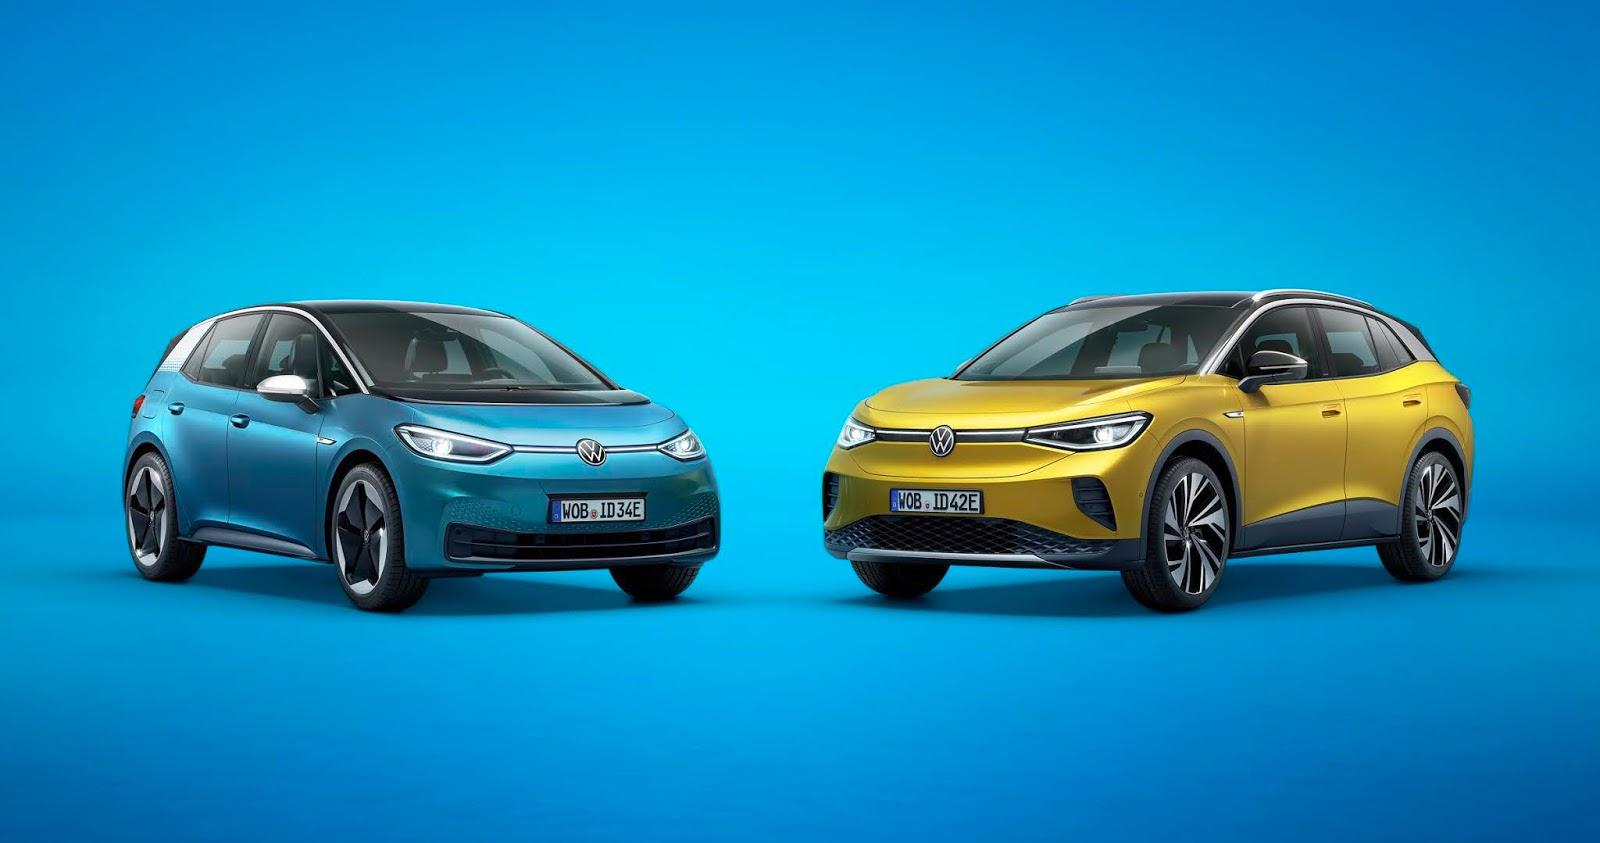 VOLKSWAGEN ID.32B25262BID.4 Volkswagen : Κυρίαρχη στην ηλεκτροκίνηση το 2021 Electric cars, electric vehicles, Hybrid, plug-in hybrid, Volkswagen, zblog, ειδήσεις, ηλεκτρικά, ηλεκτροκινηση, υβριδικό